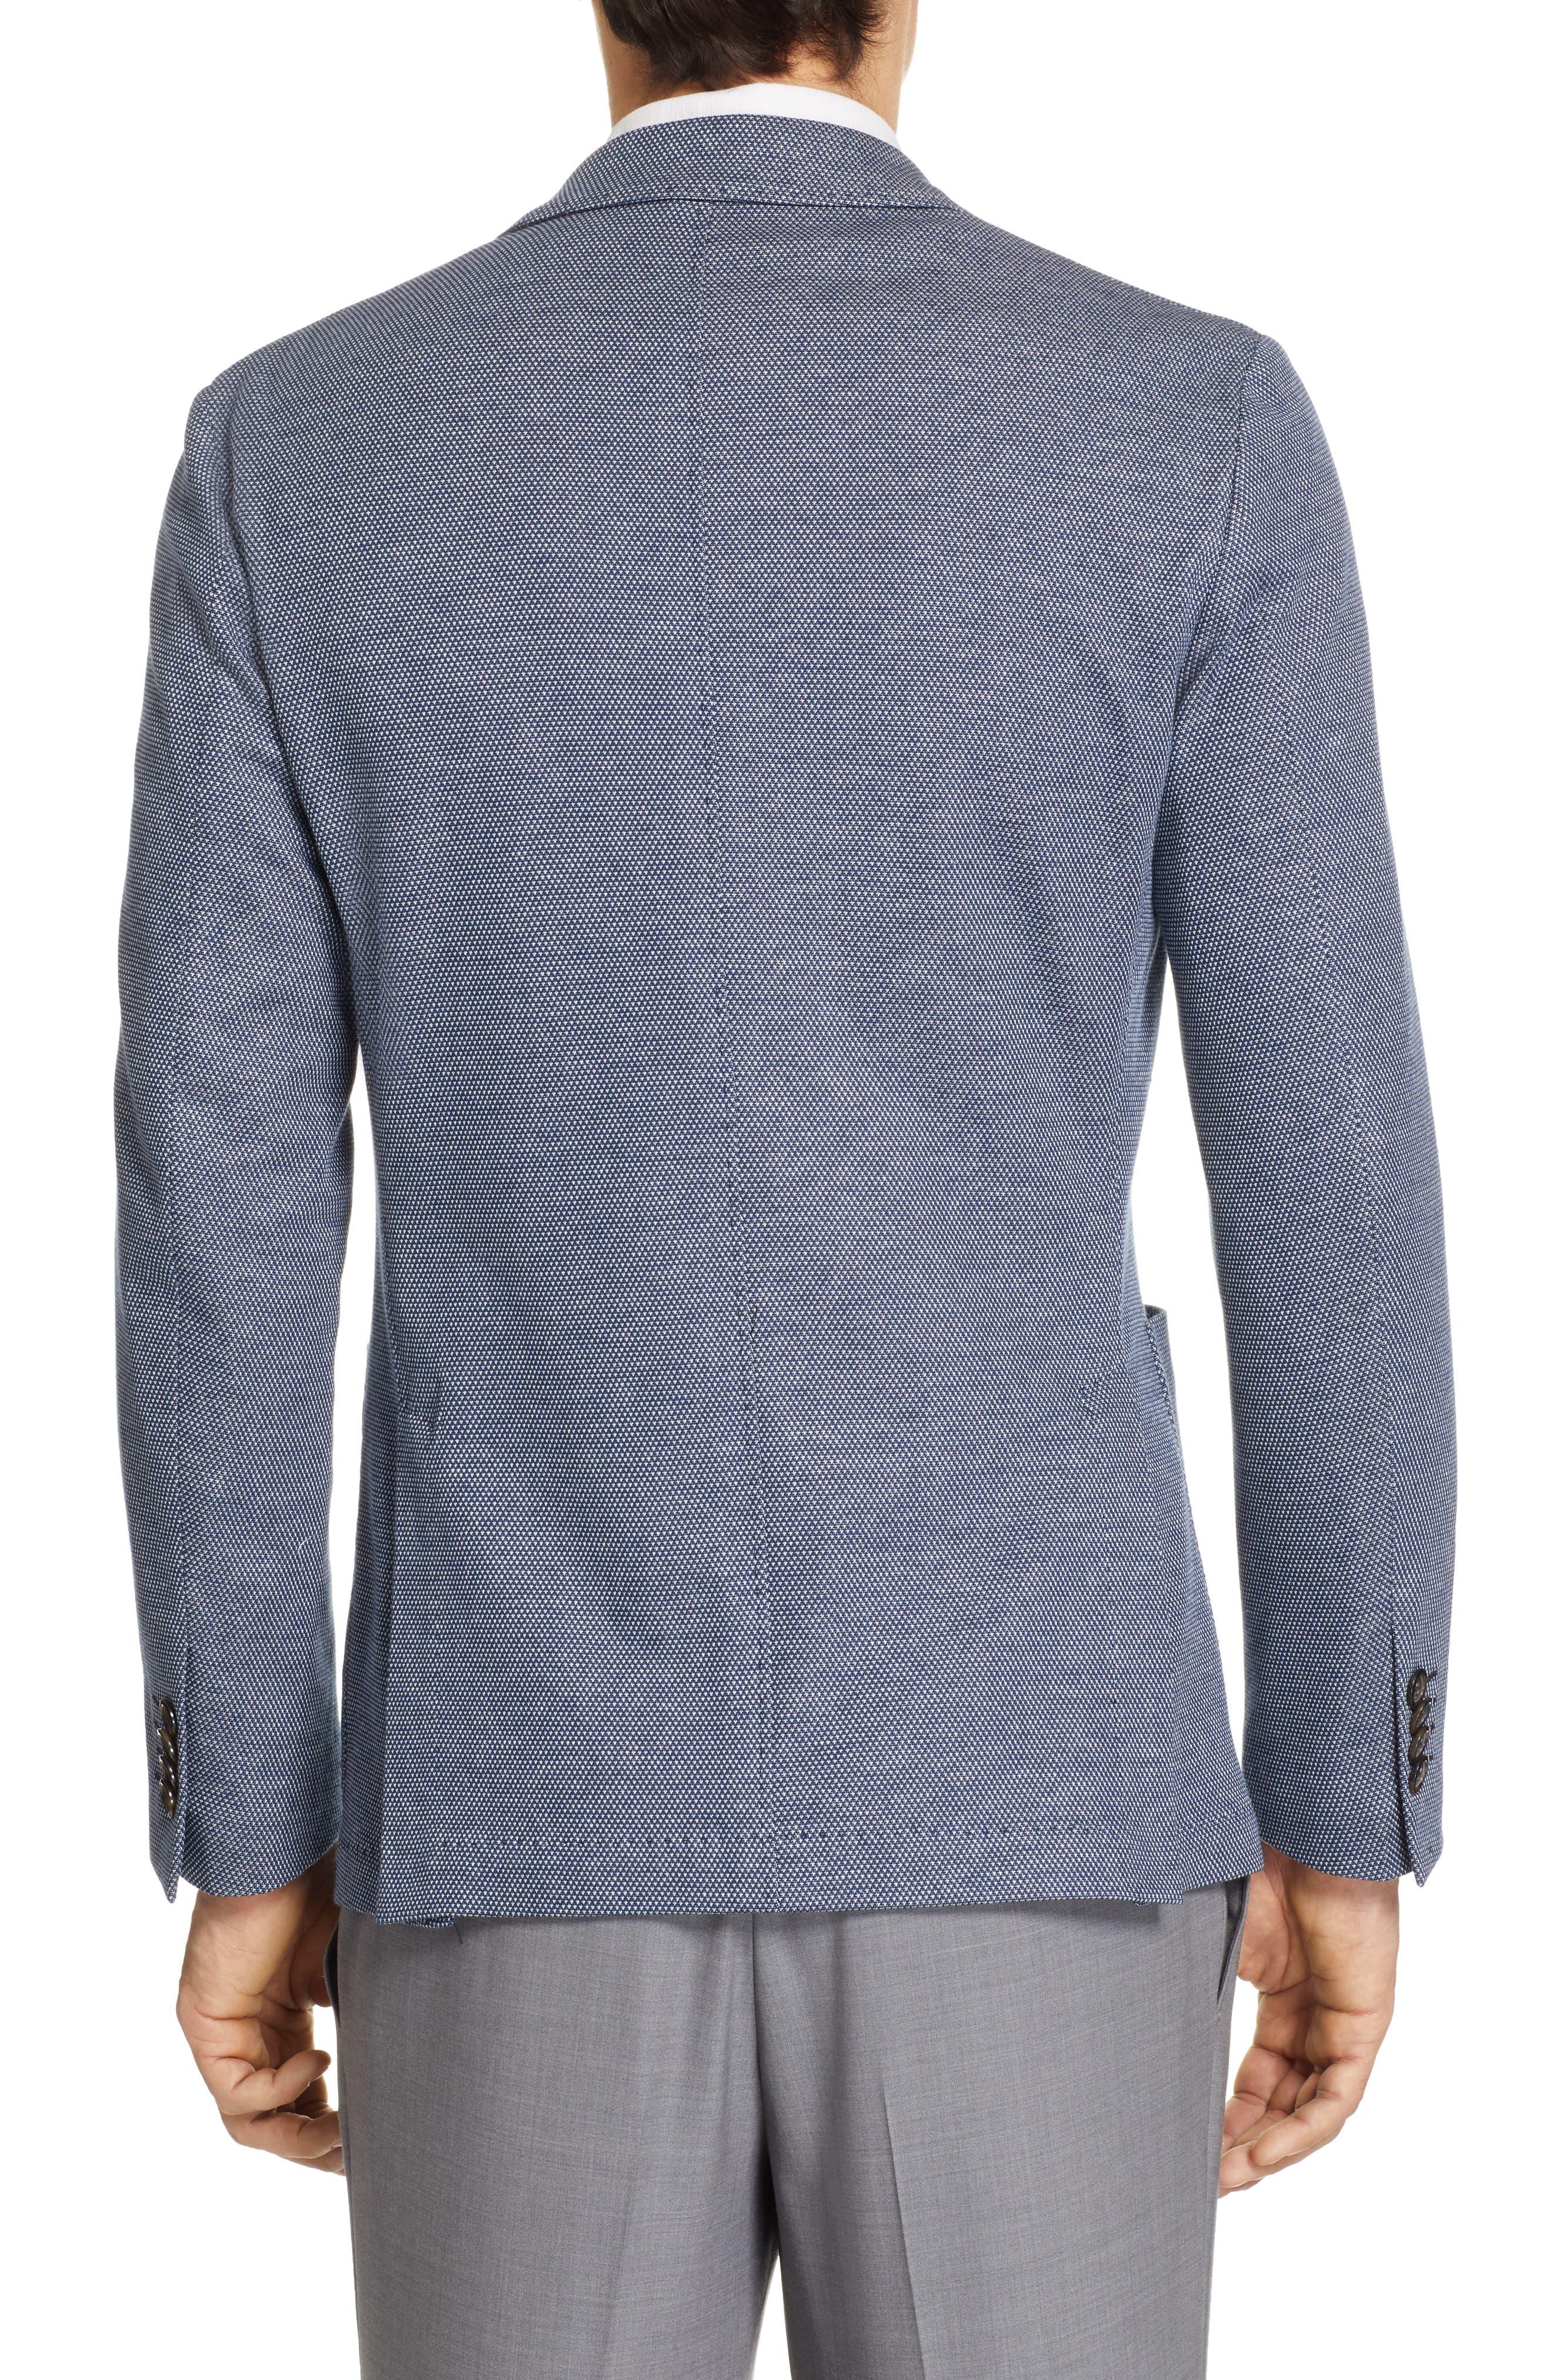 CANALI, Classic Fit Cotton Blend Sport Coat, Alternate thumbnail 2, color, NAVY